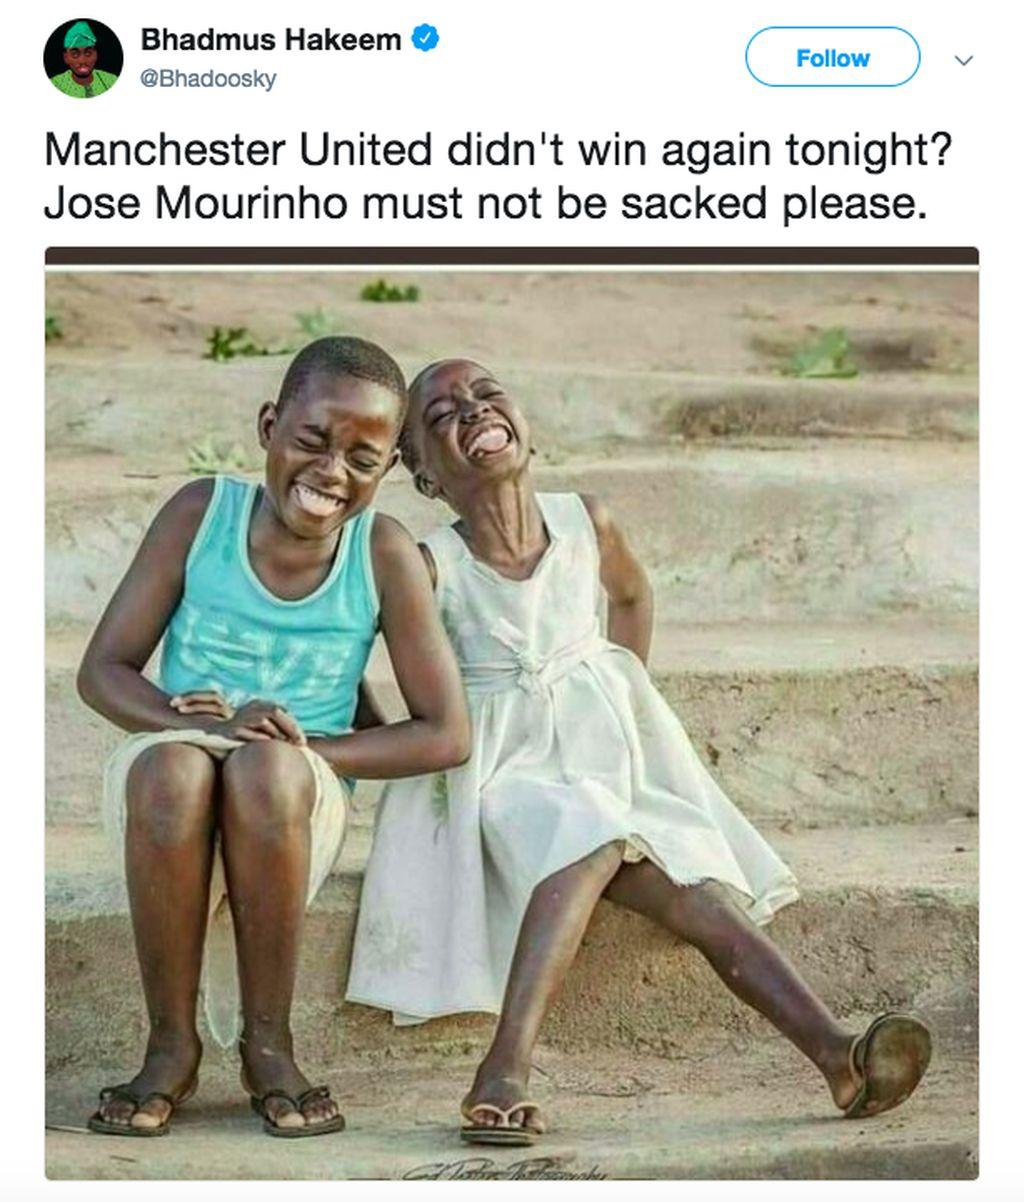 Manchestere United gagal menang lagi? Please, jangan pecat Mourinho. Foto: istimewa